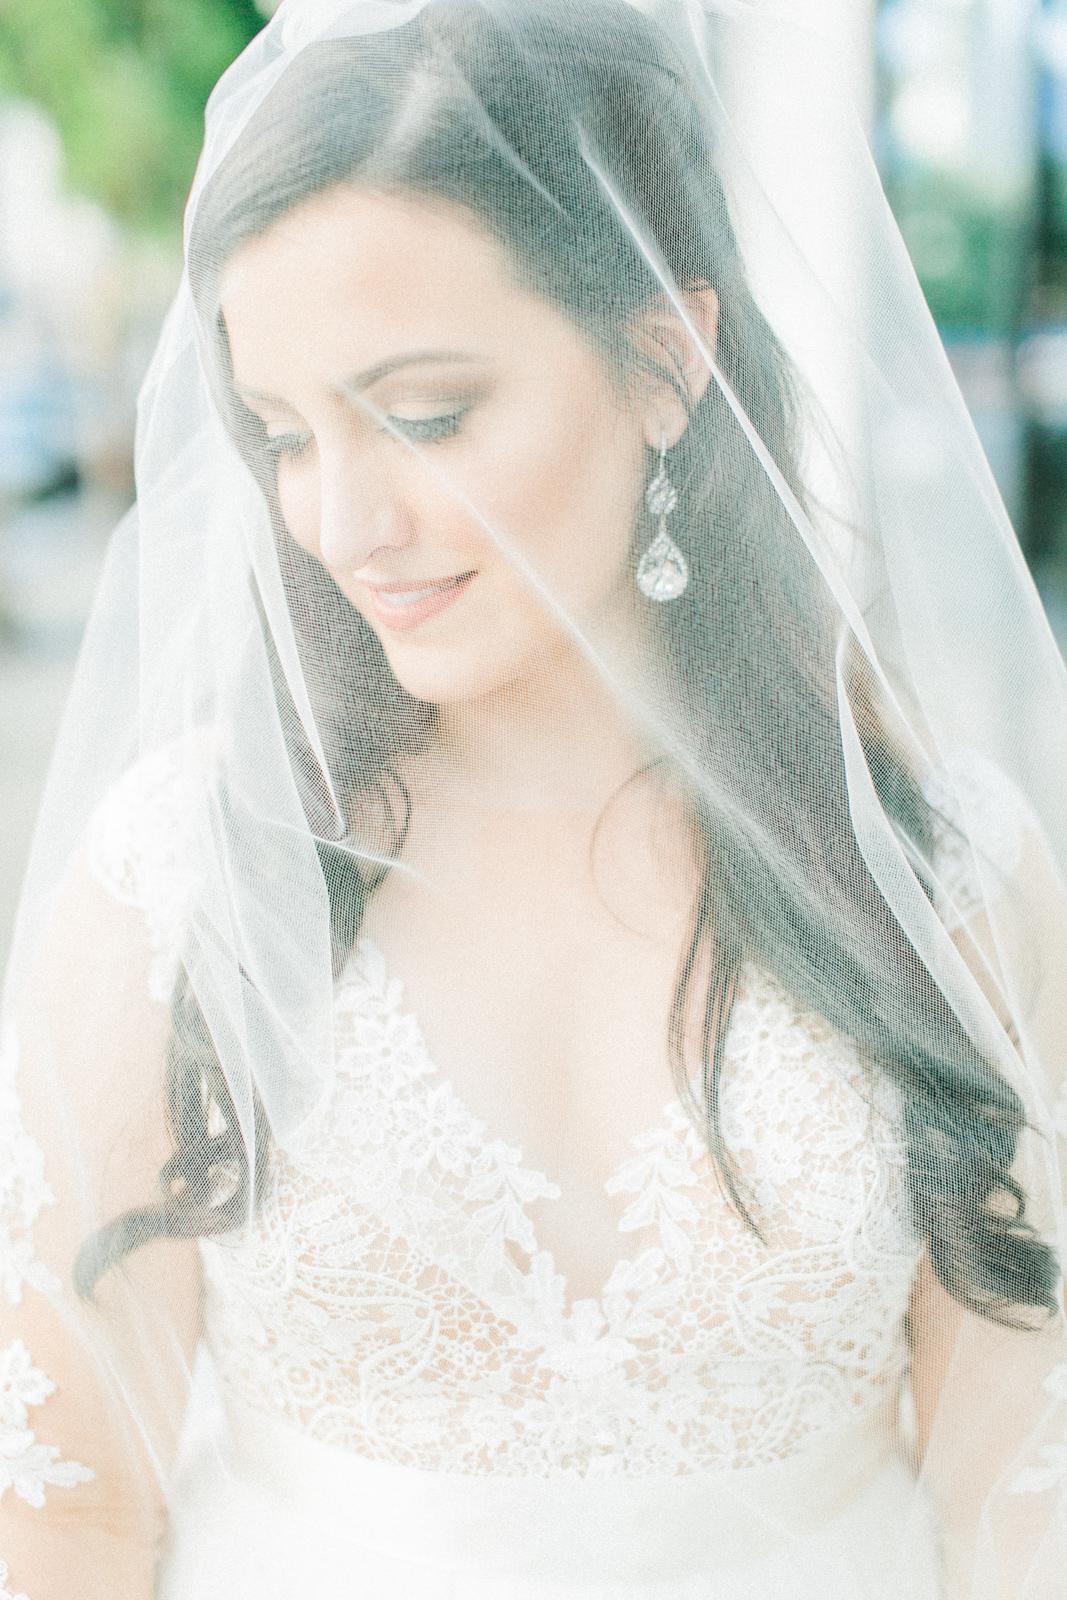 boise-idaho-elopement-engagement-photographer-0635.jpg